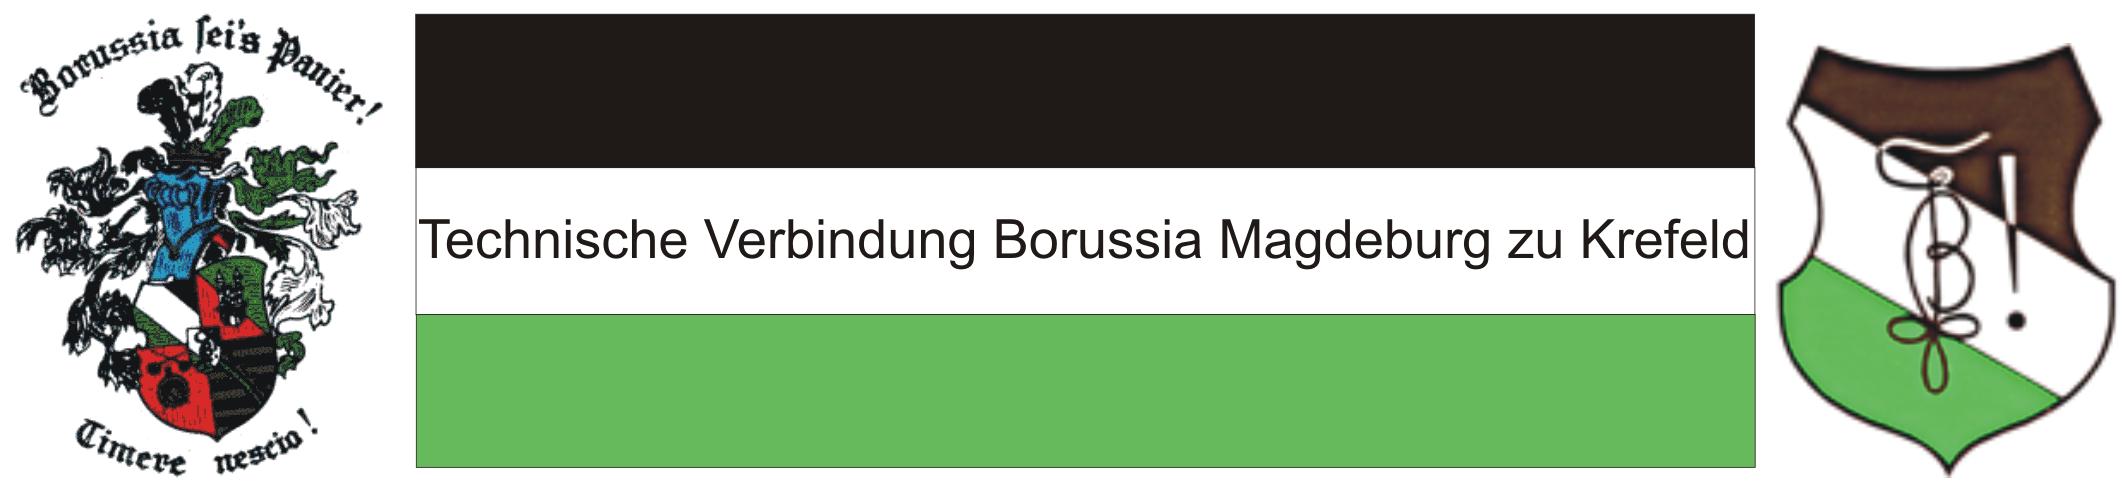 TV-Borussia Magdeburg zu Krefeld